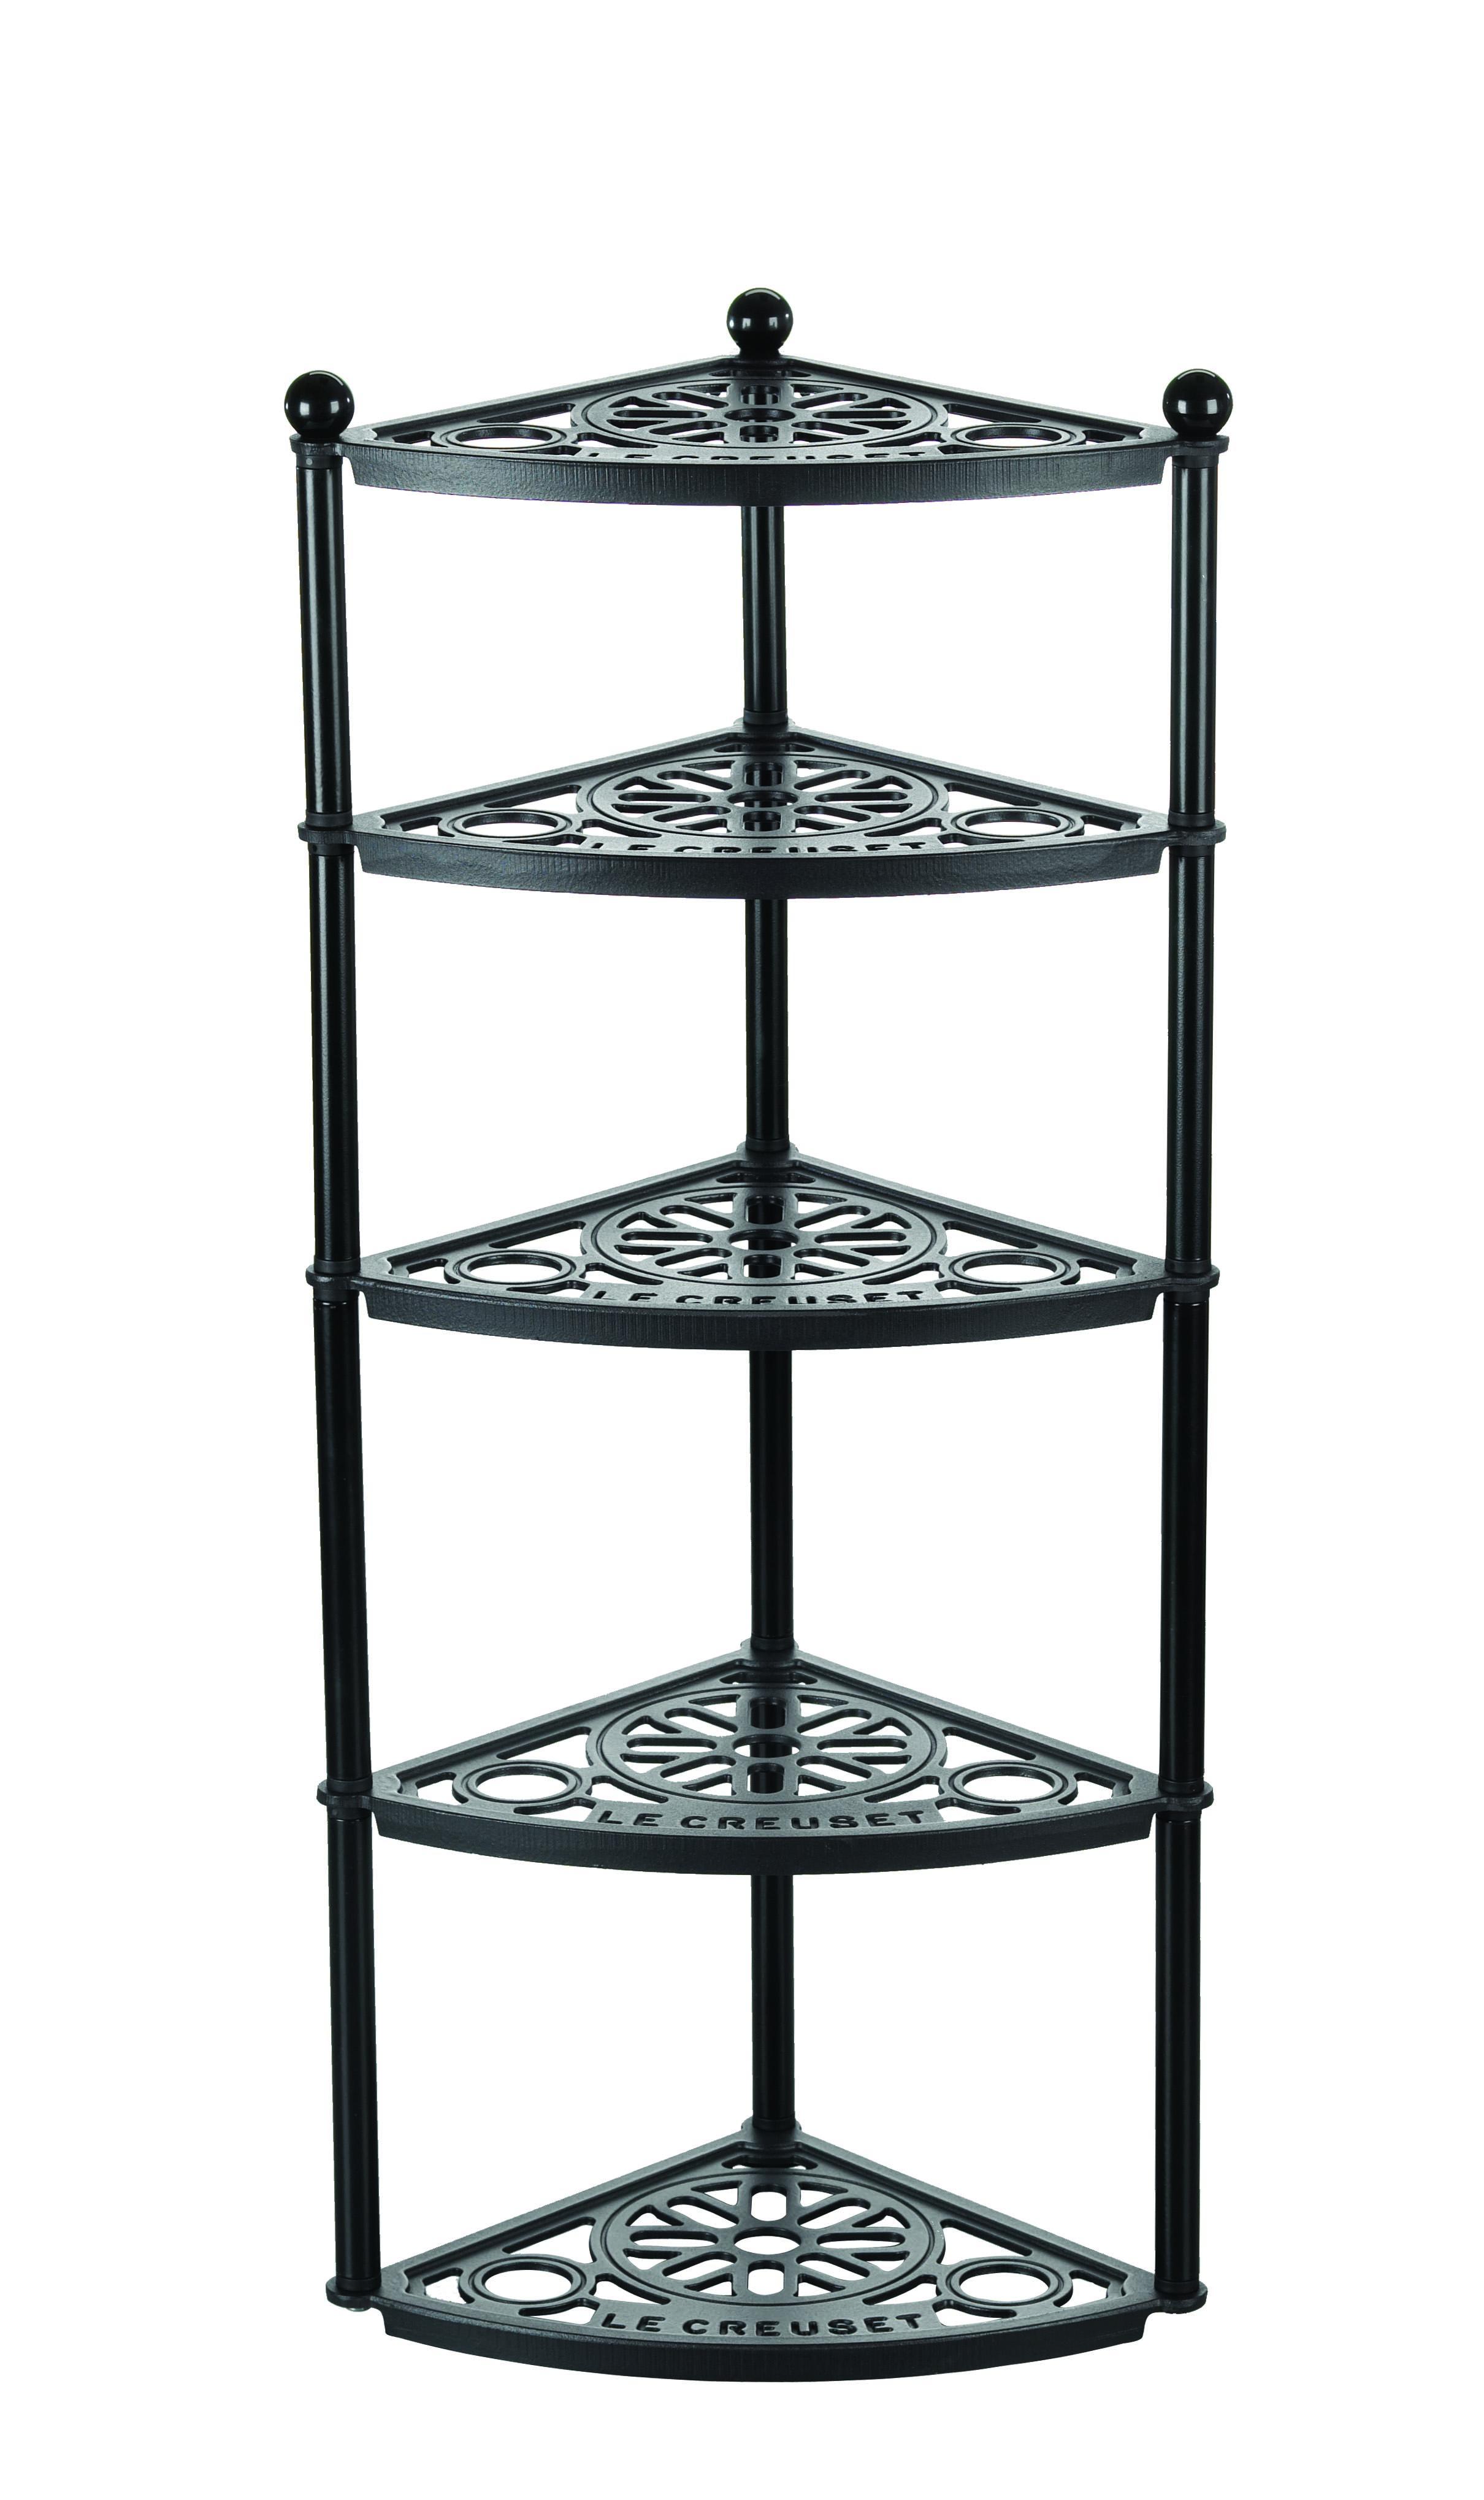 Le Creuset Black Enameled Cast Iron 35 Inch 5 Shelf Cookware Pot Stand